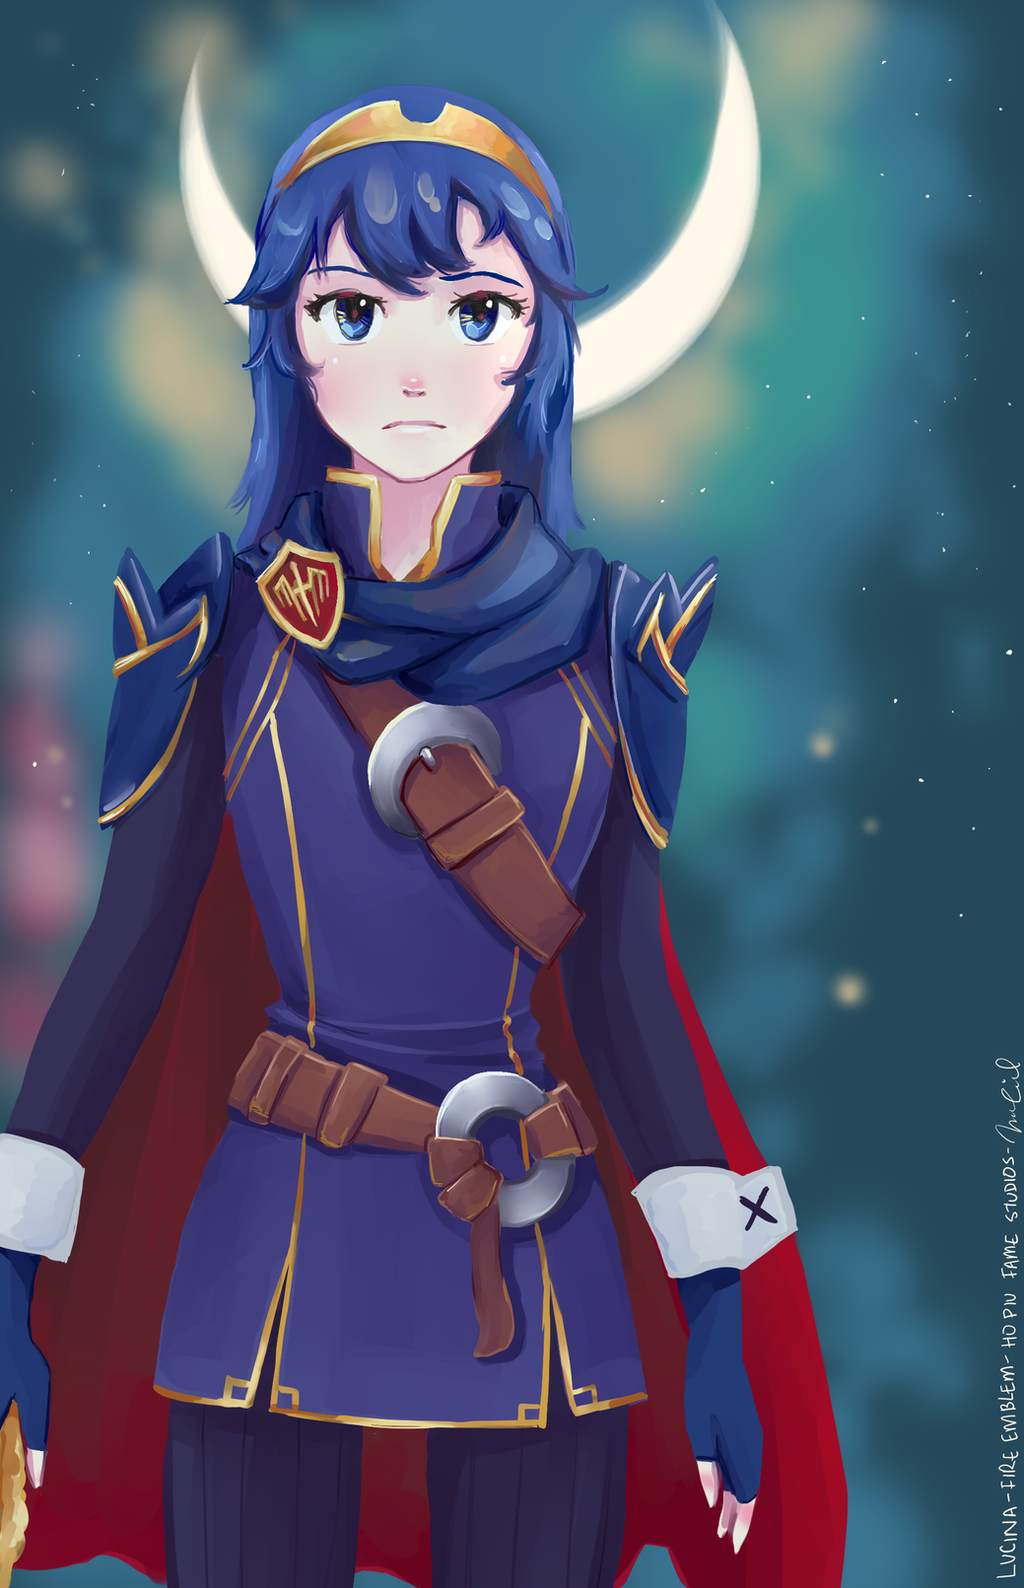 Lucina (Fire Emblem Awakening) by kytobitt on DeviantArt